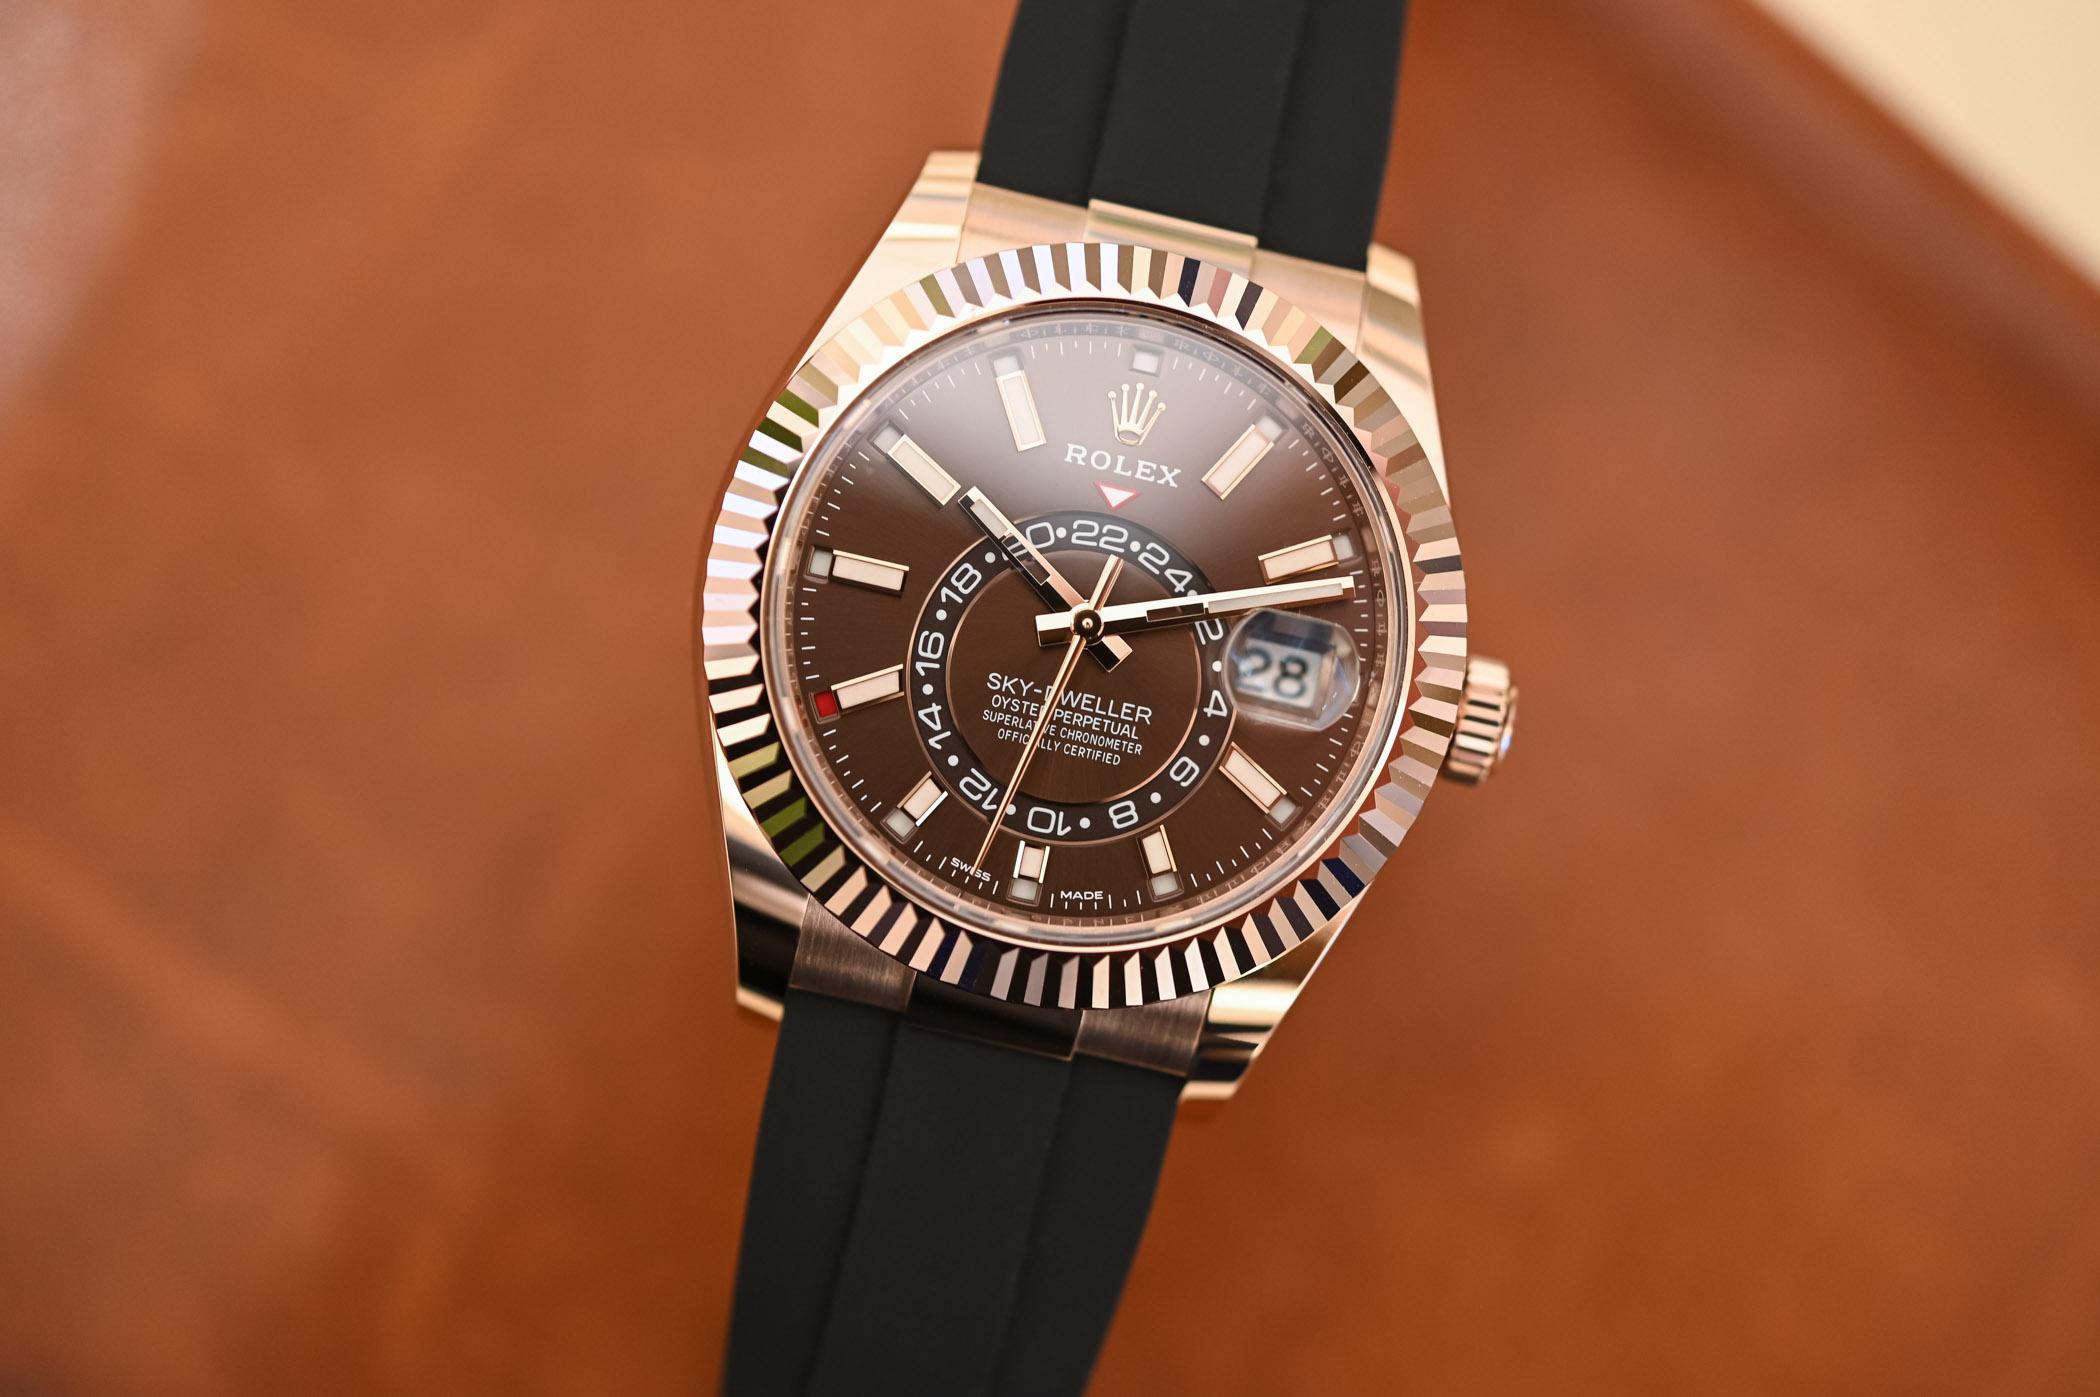 Rolex Sky-Dweller Oysterflex Bracelet Everose Gold Chocolate Dial 326235 - 1